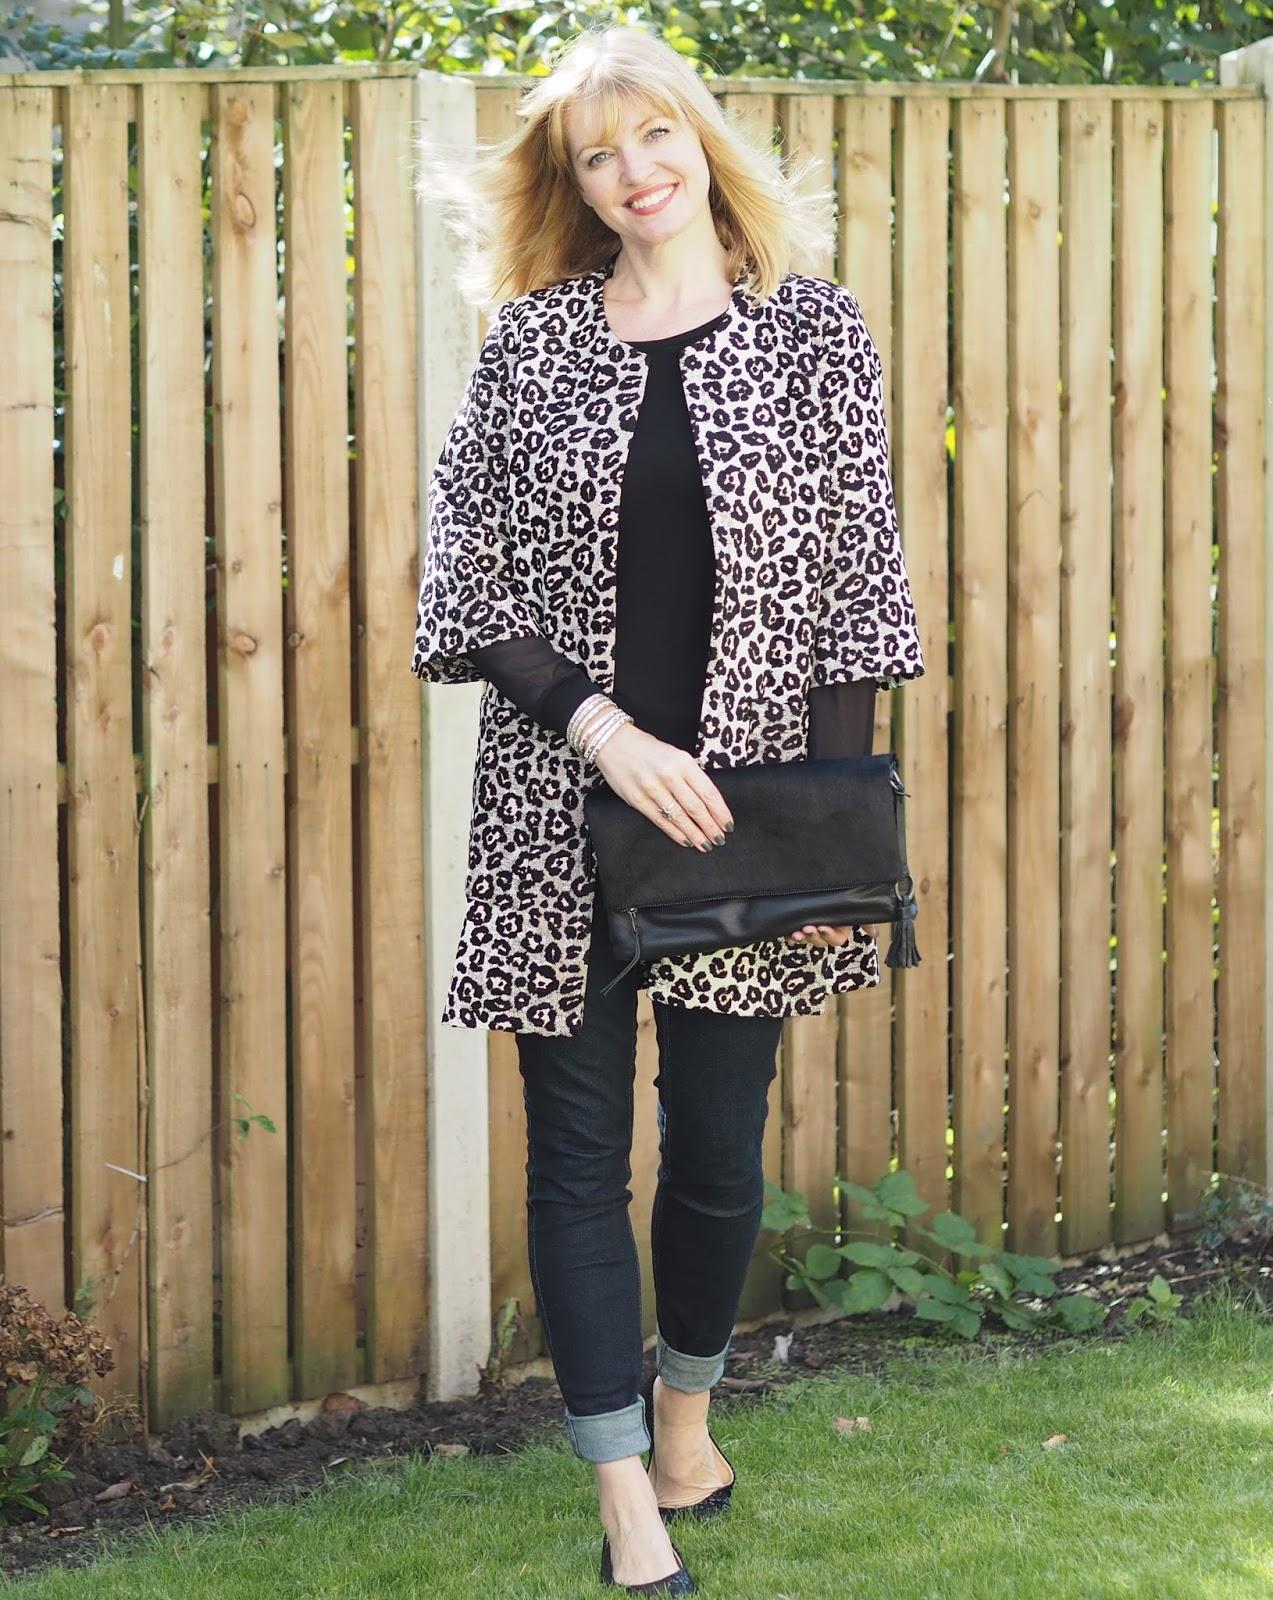 Animal leopard print jacquard jacket and skinny jeans